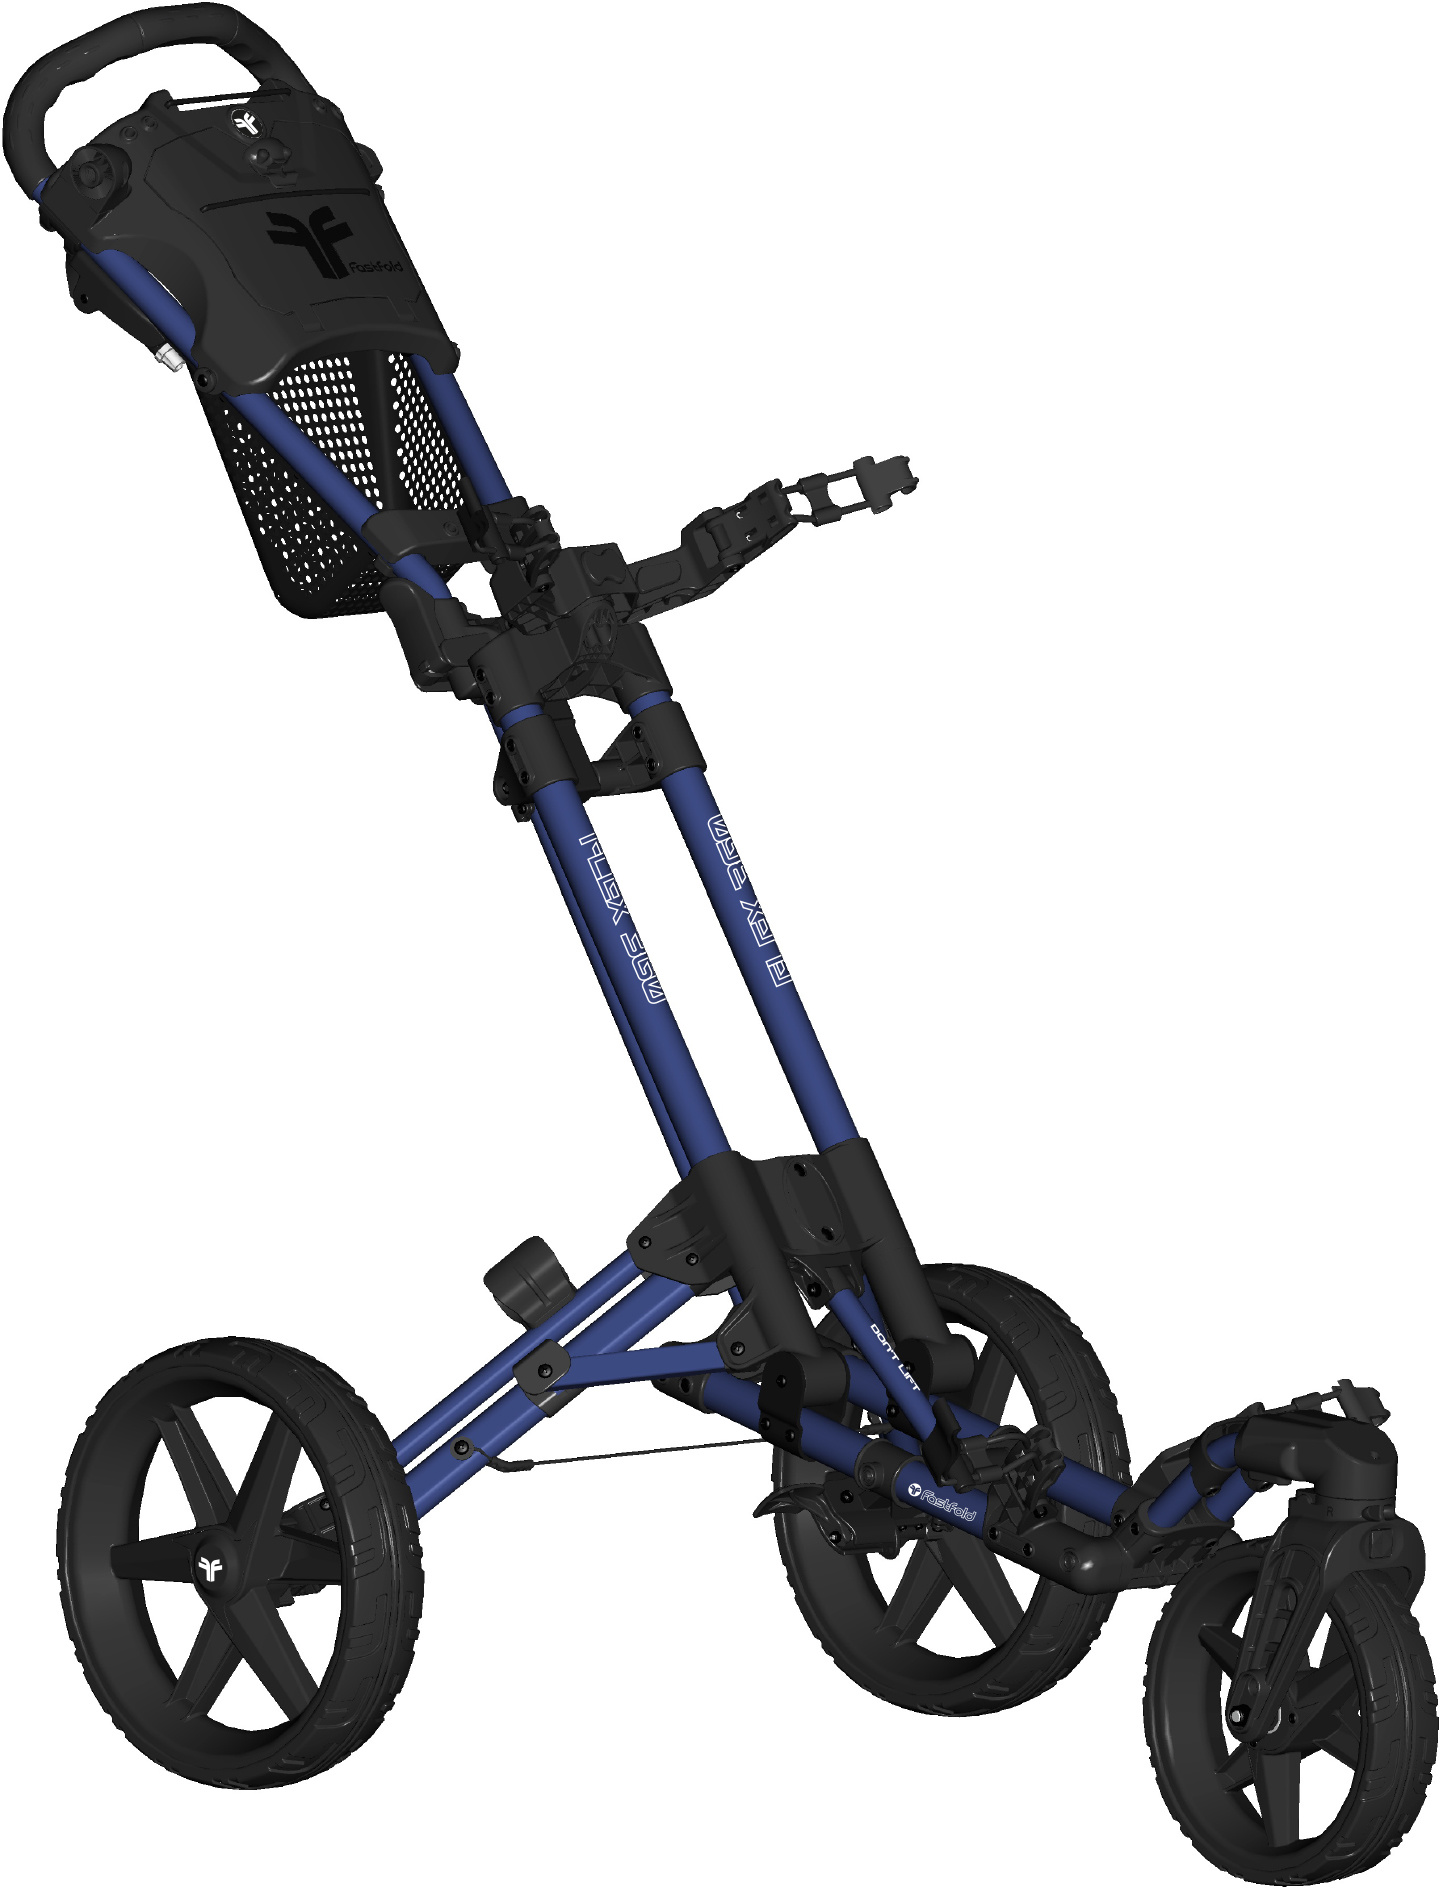 FastFold Fastfold Flex 360 Blue/Black